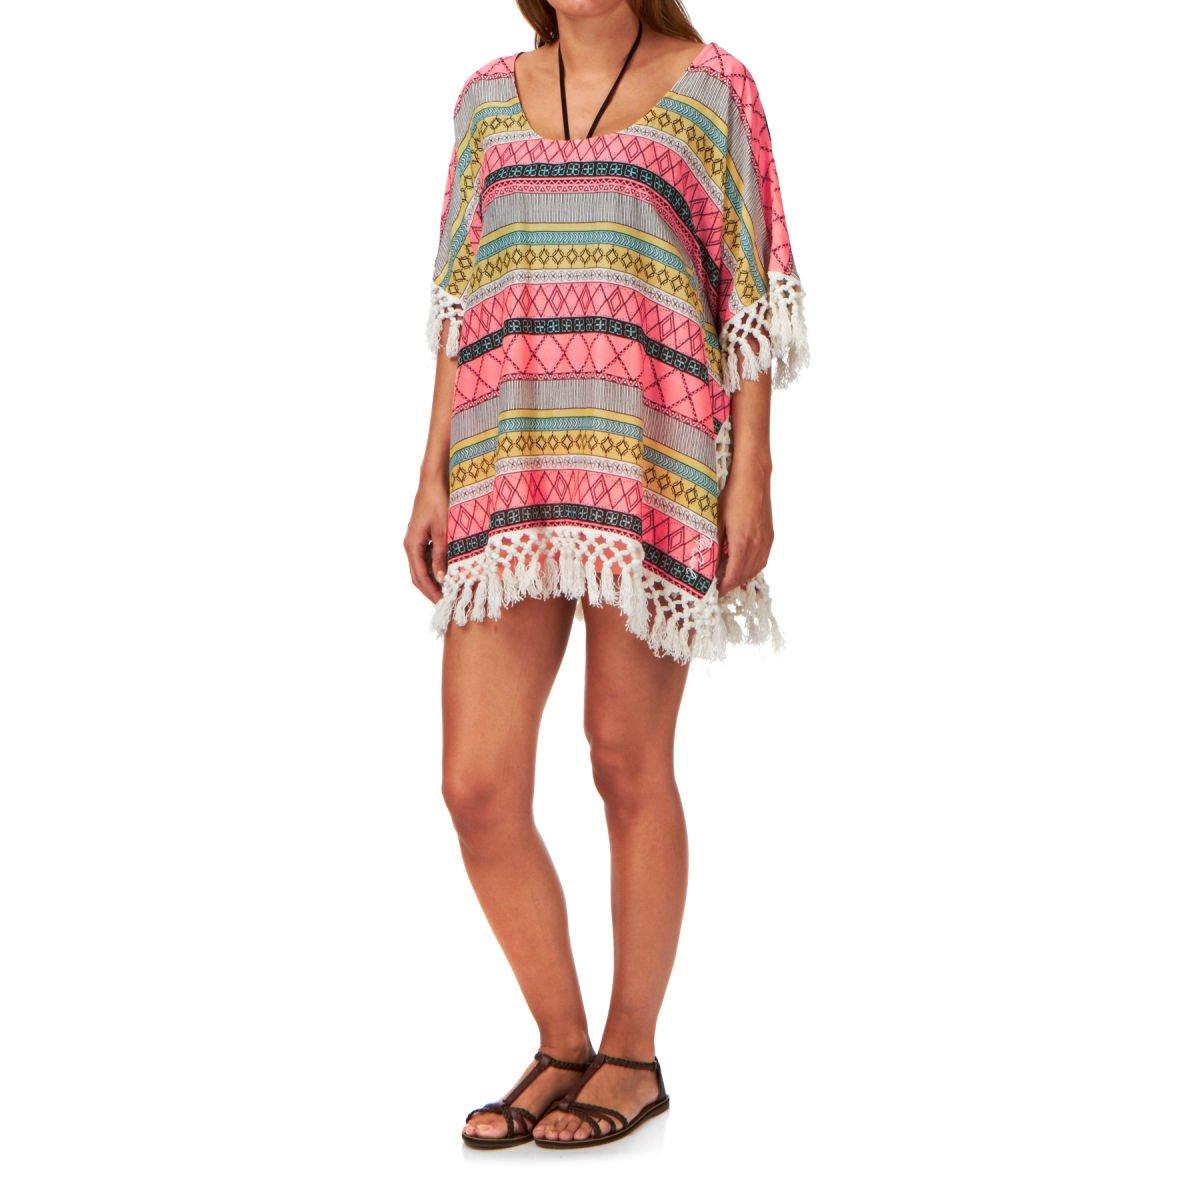 Rip Curl Damen Bali Dancer Cover Up Azteken Beach Kleid